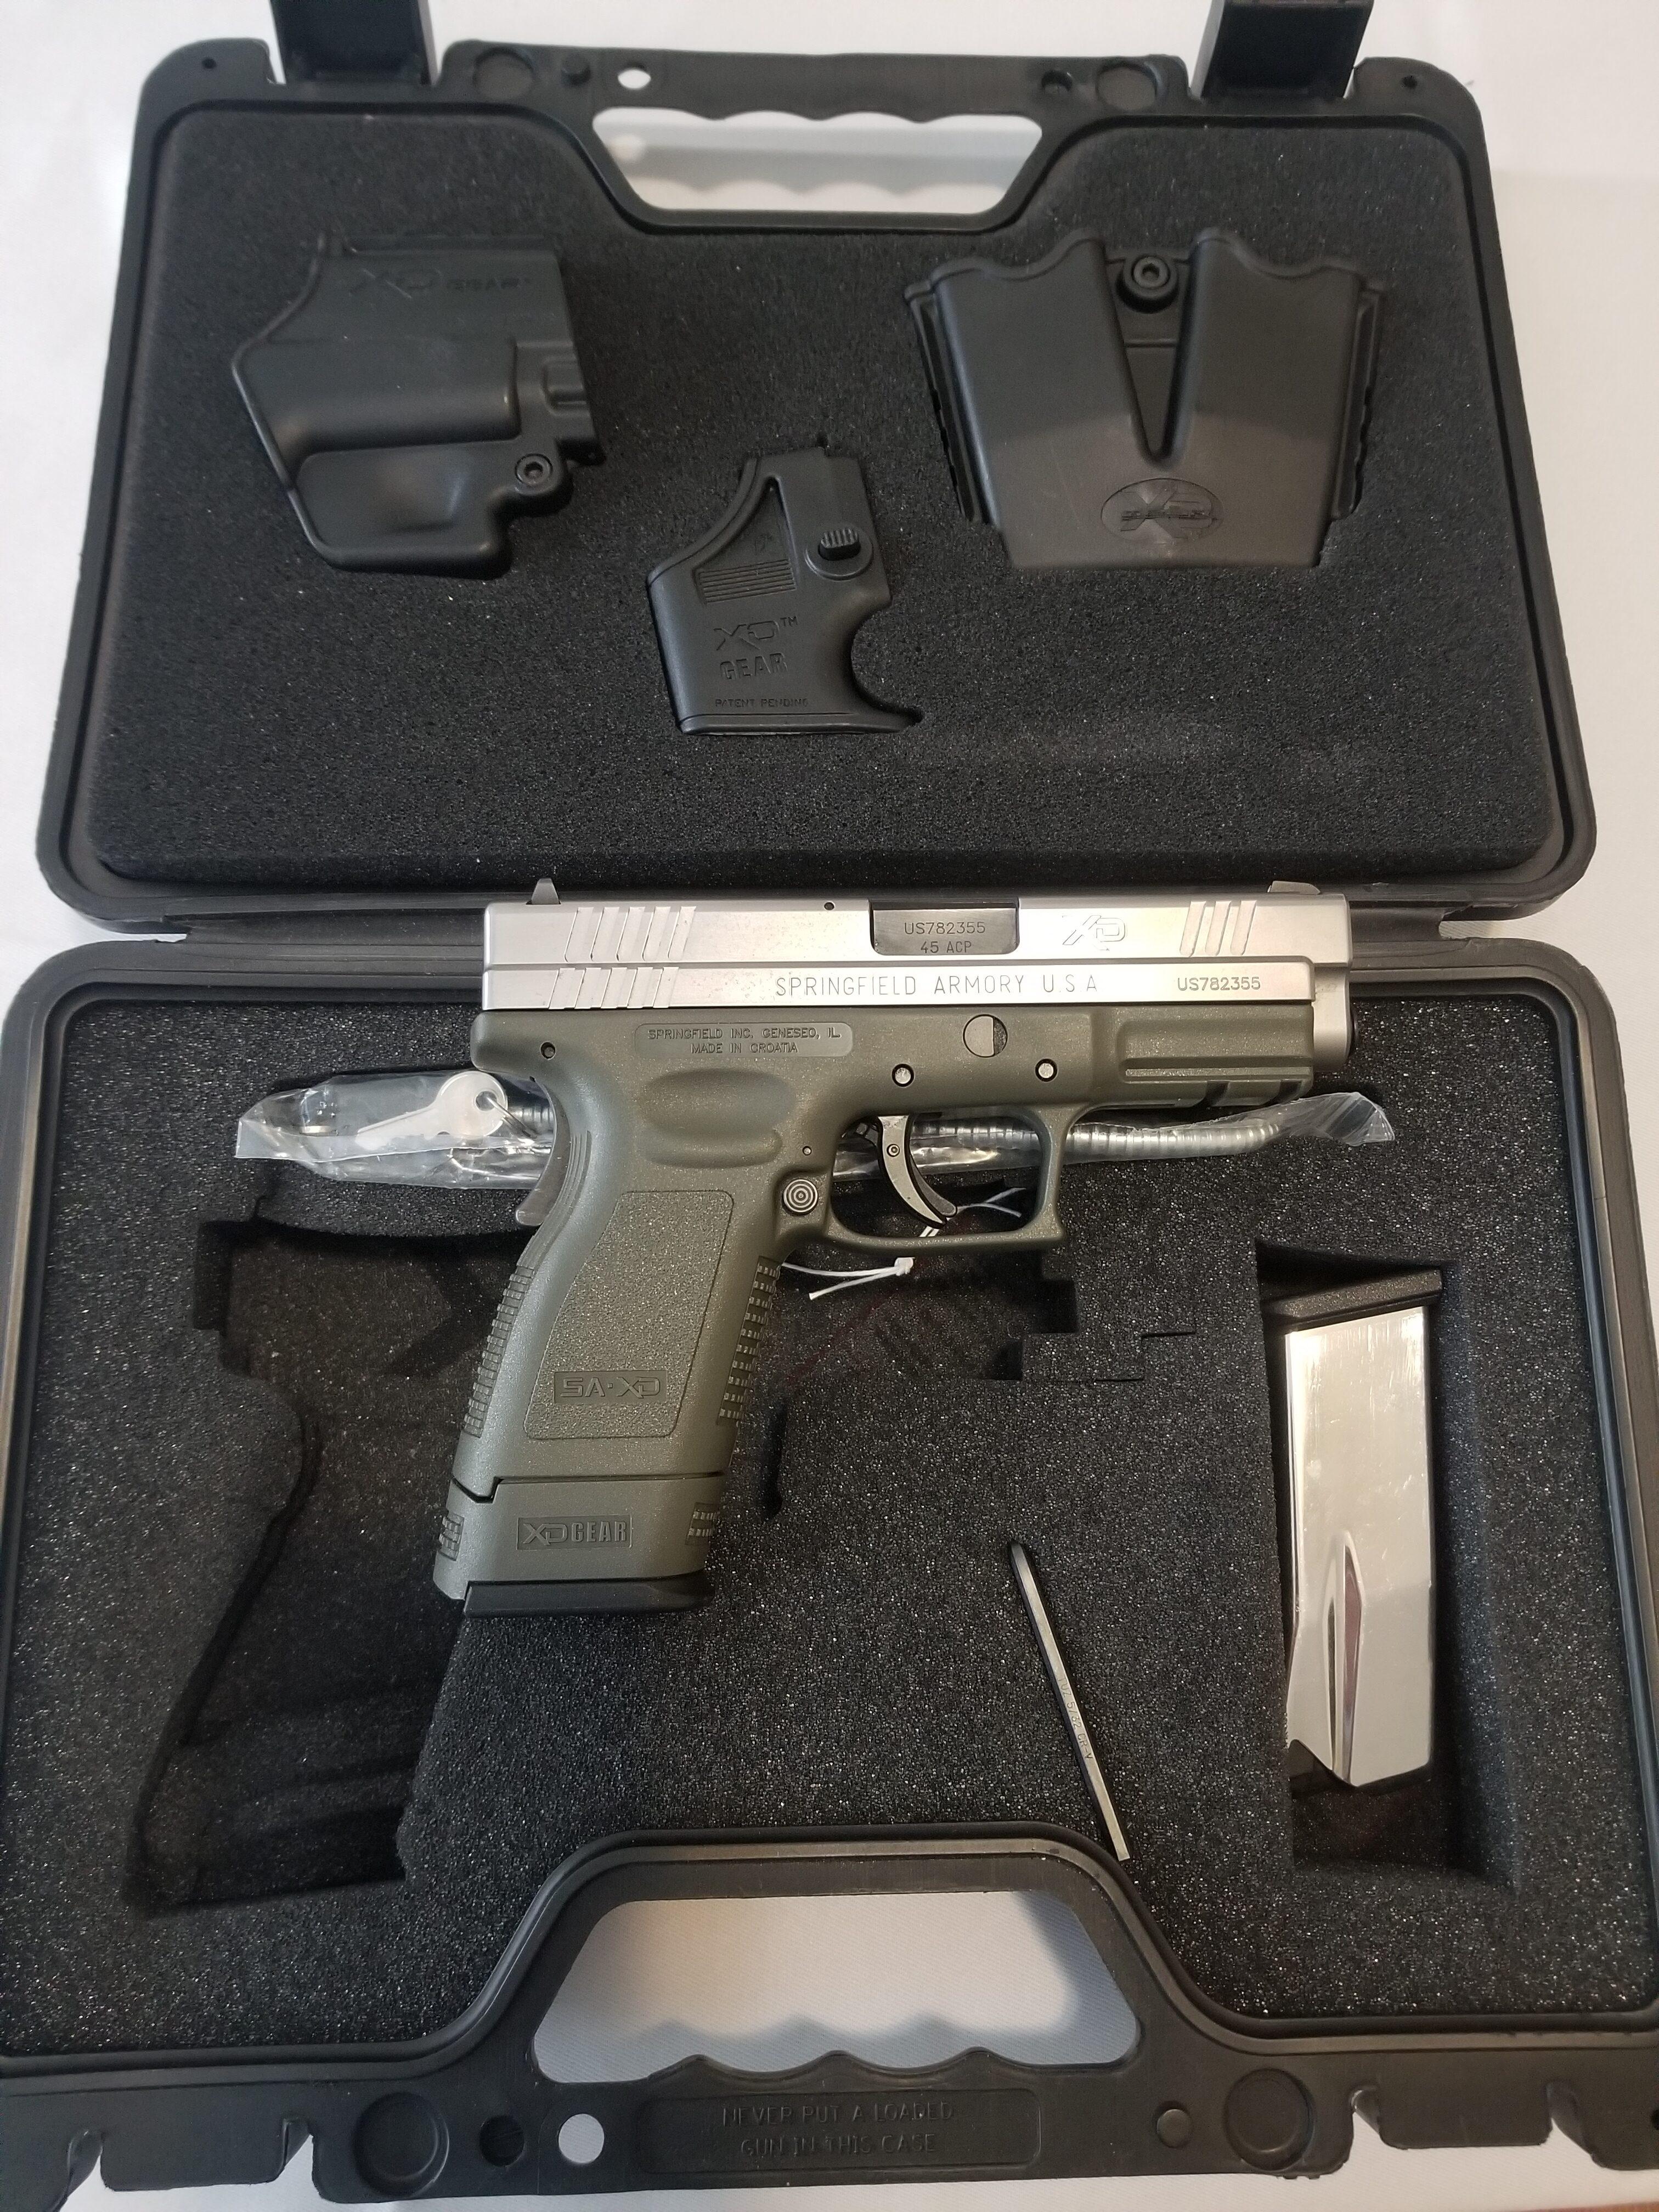 Springfield XD-45 .45 Caliber Semi-Auto Pistol